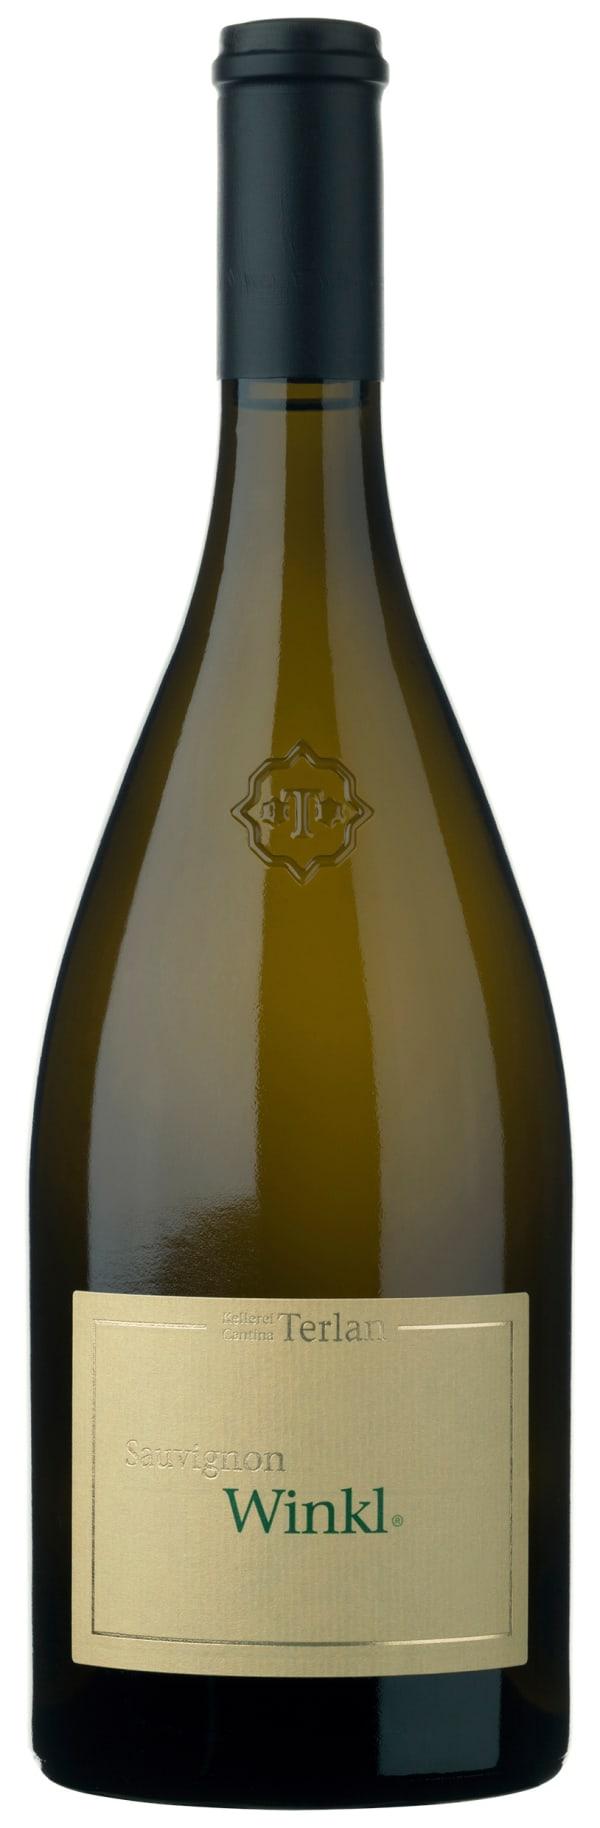 Terlano Winkl Sauvignon Blanc 2017